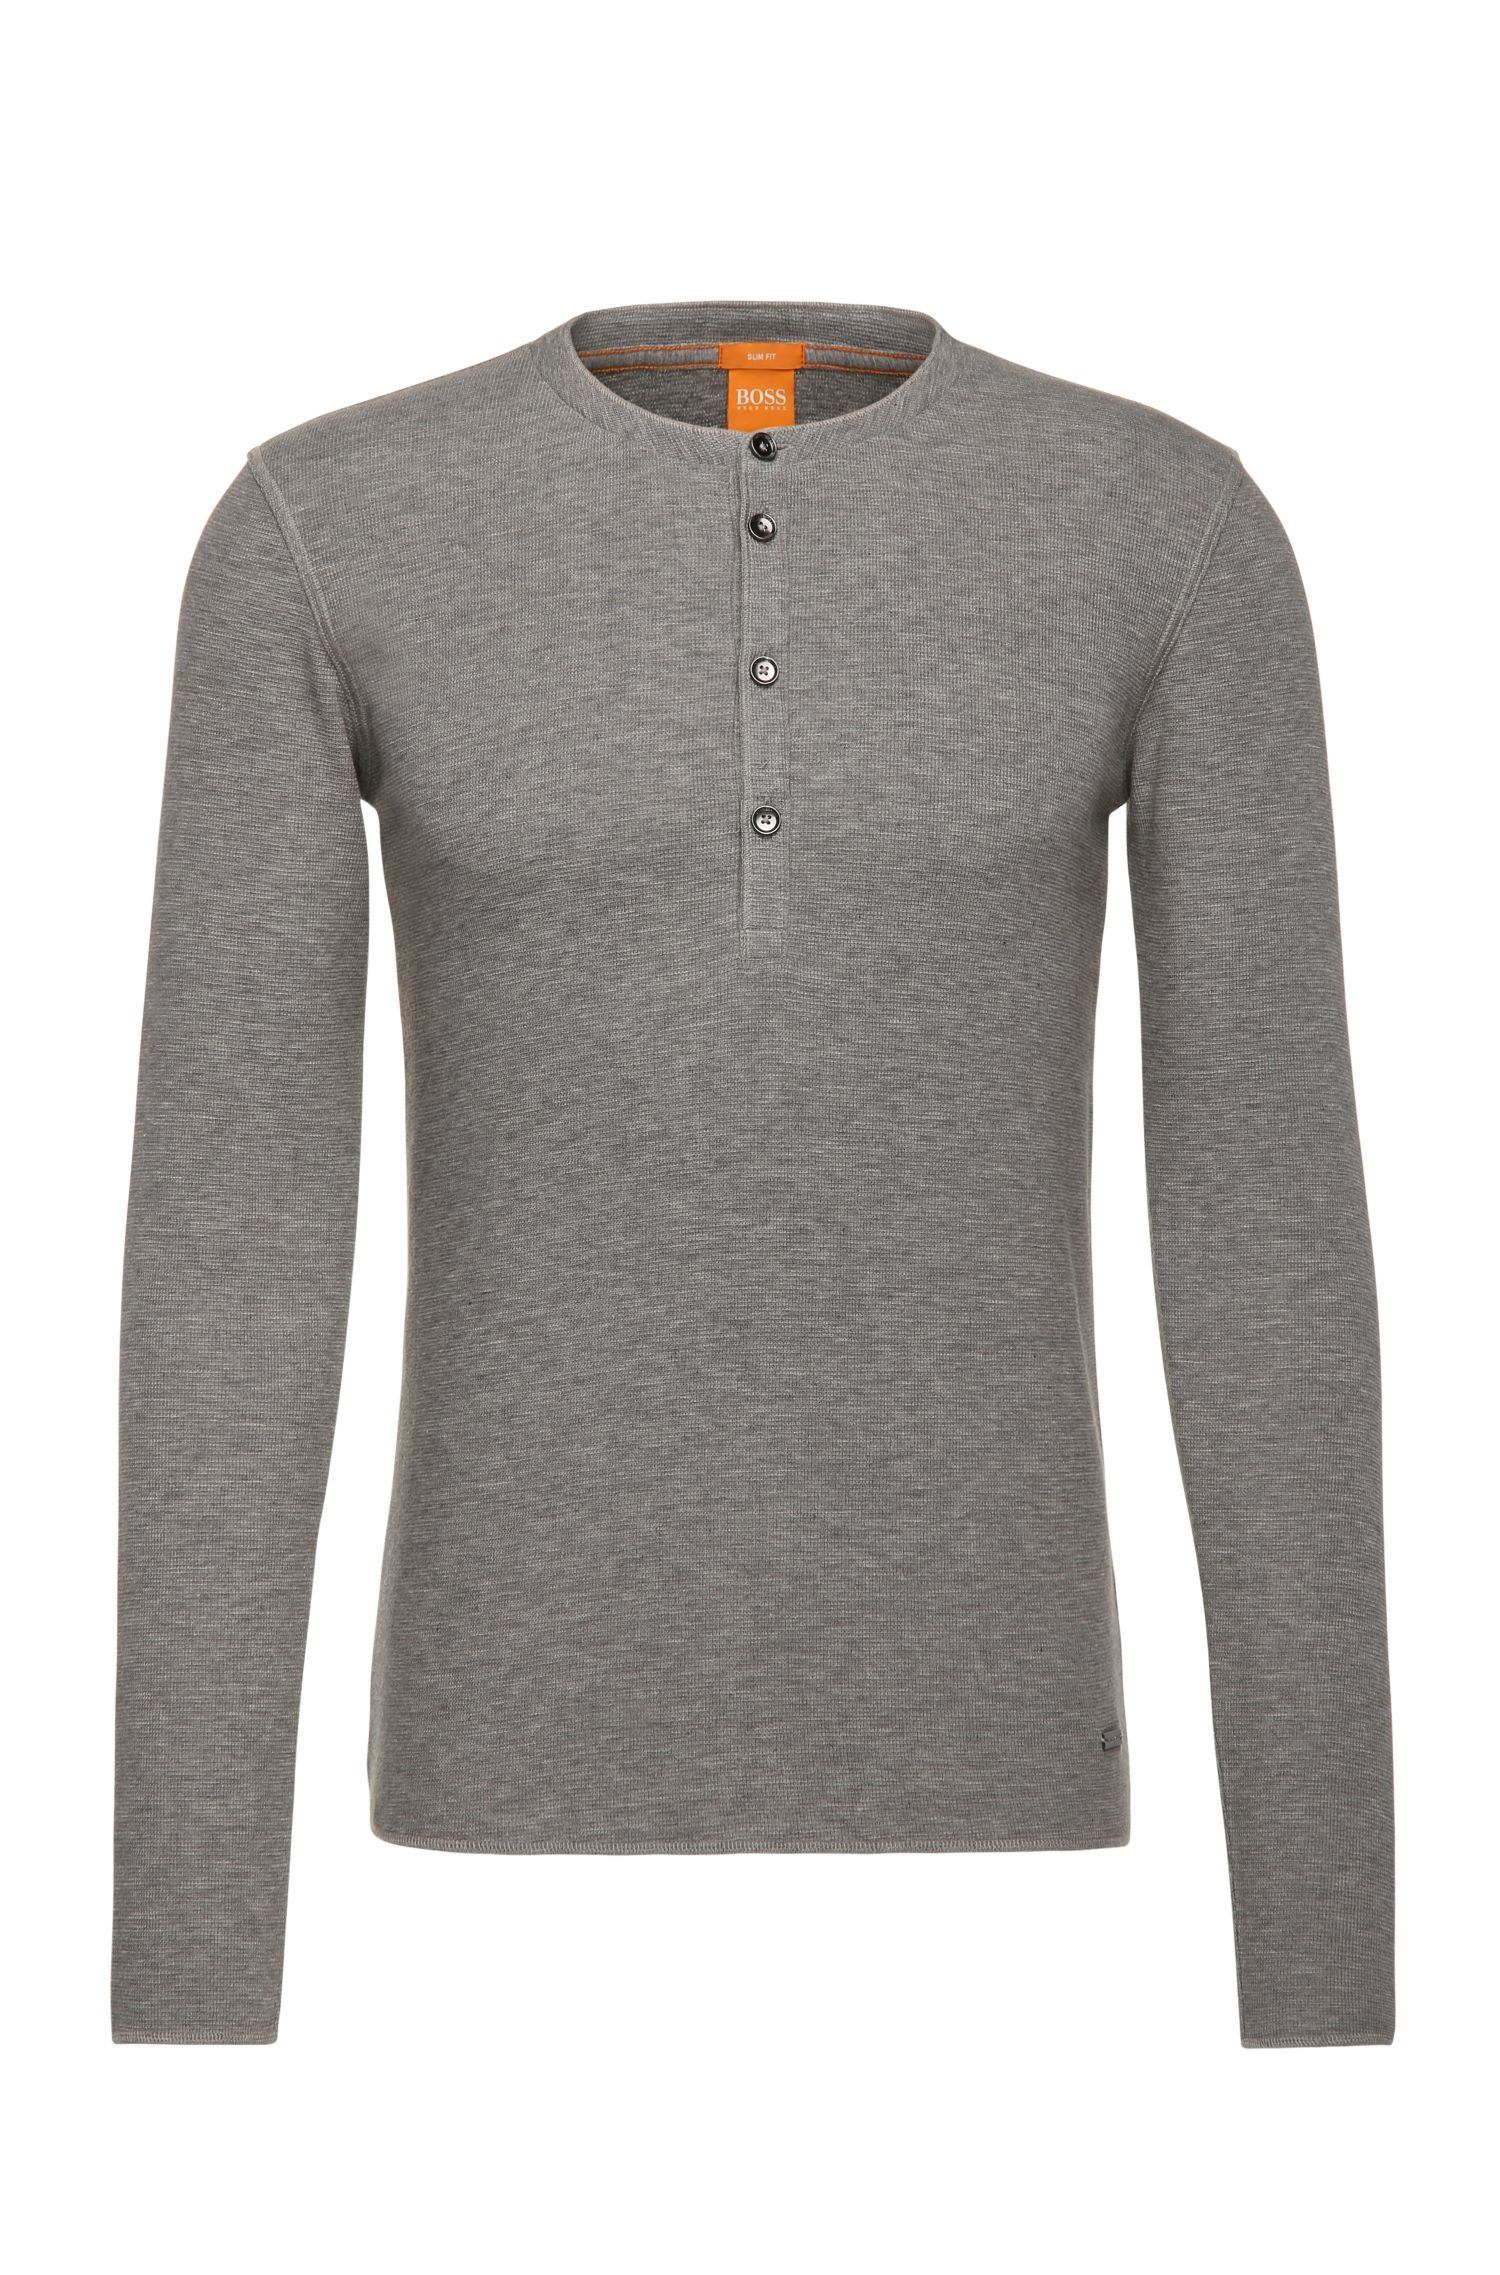 T-shirt in stile Henley slim fit in jersey di cotone singolo